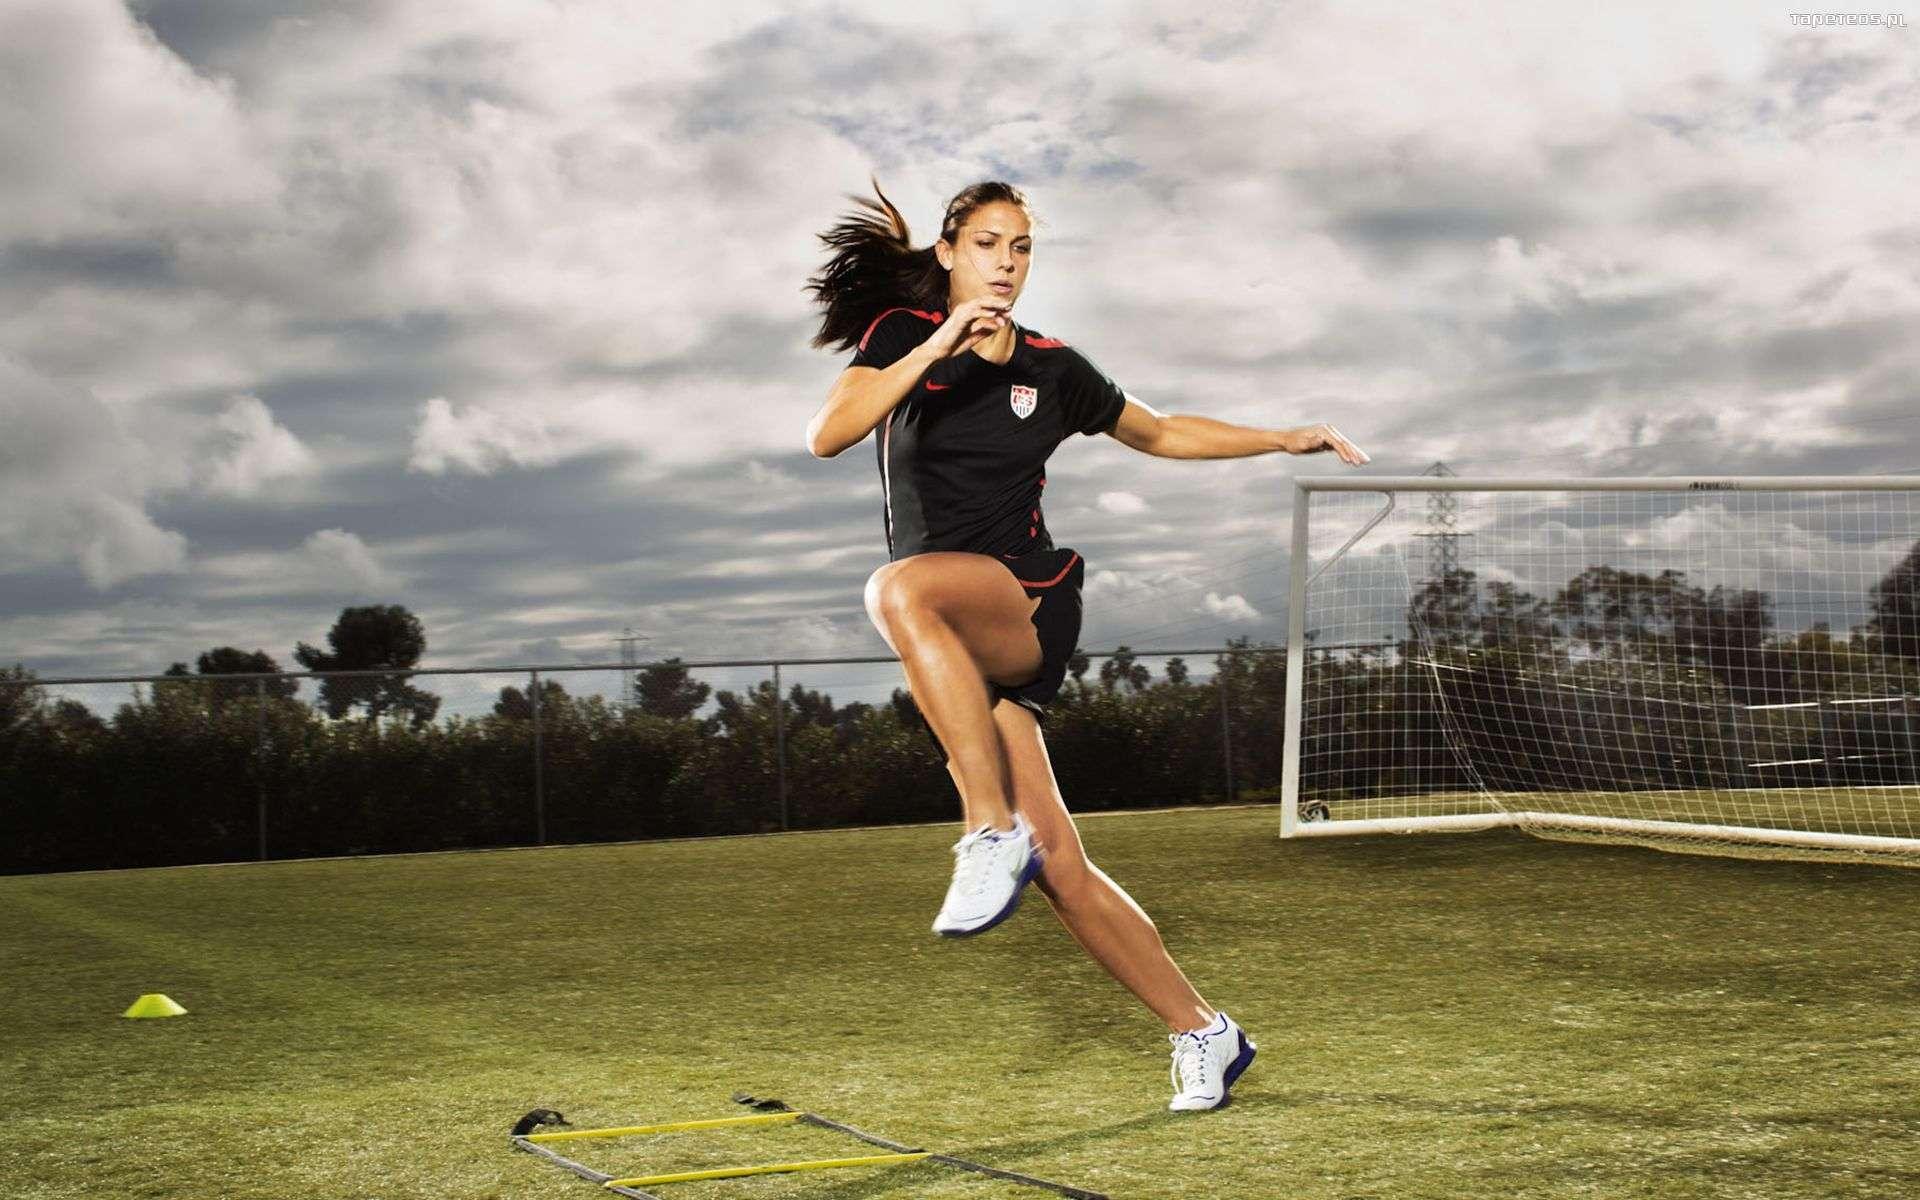 Soccer Girls Wallpaper Free: Alex Morgan Wallpapers